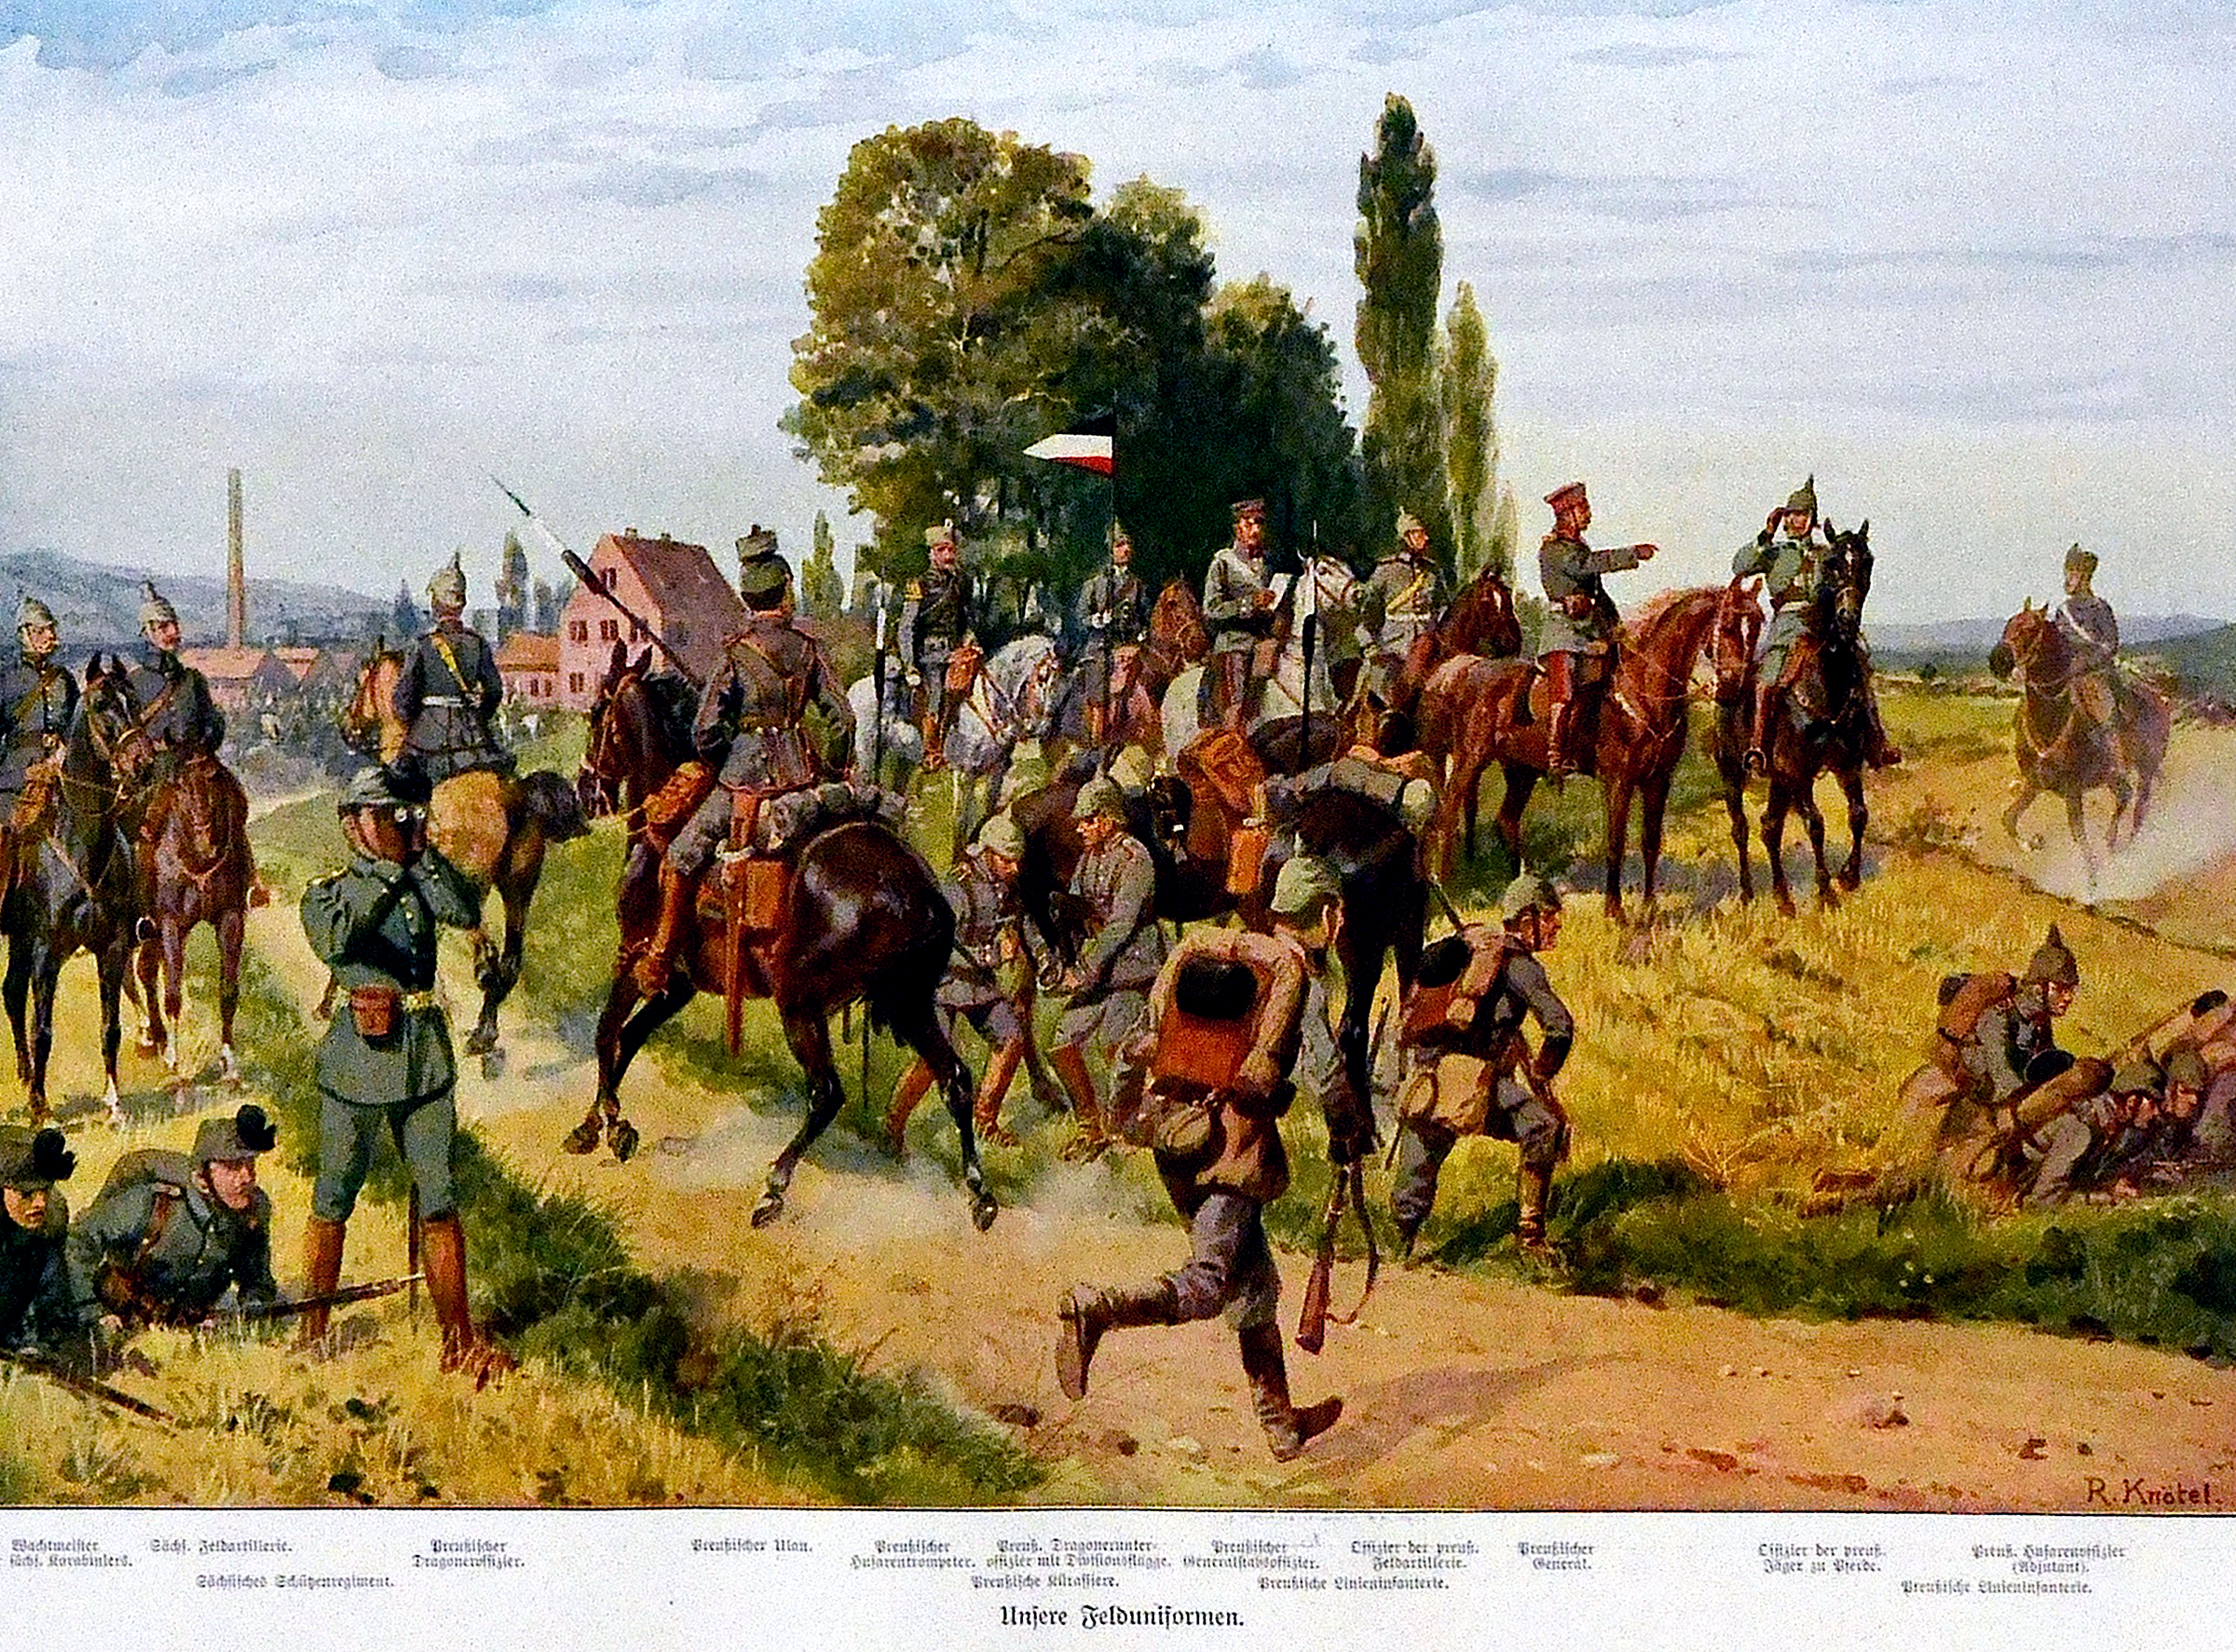 The German field uniforms -